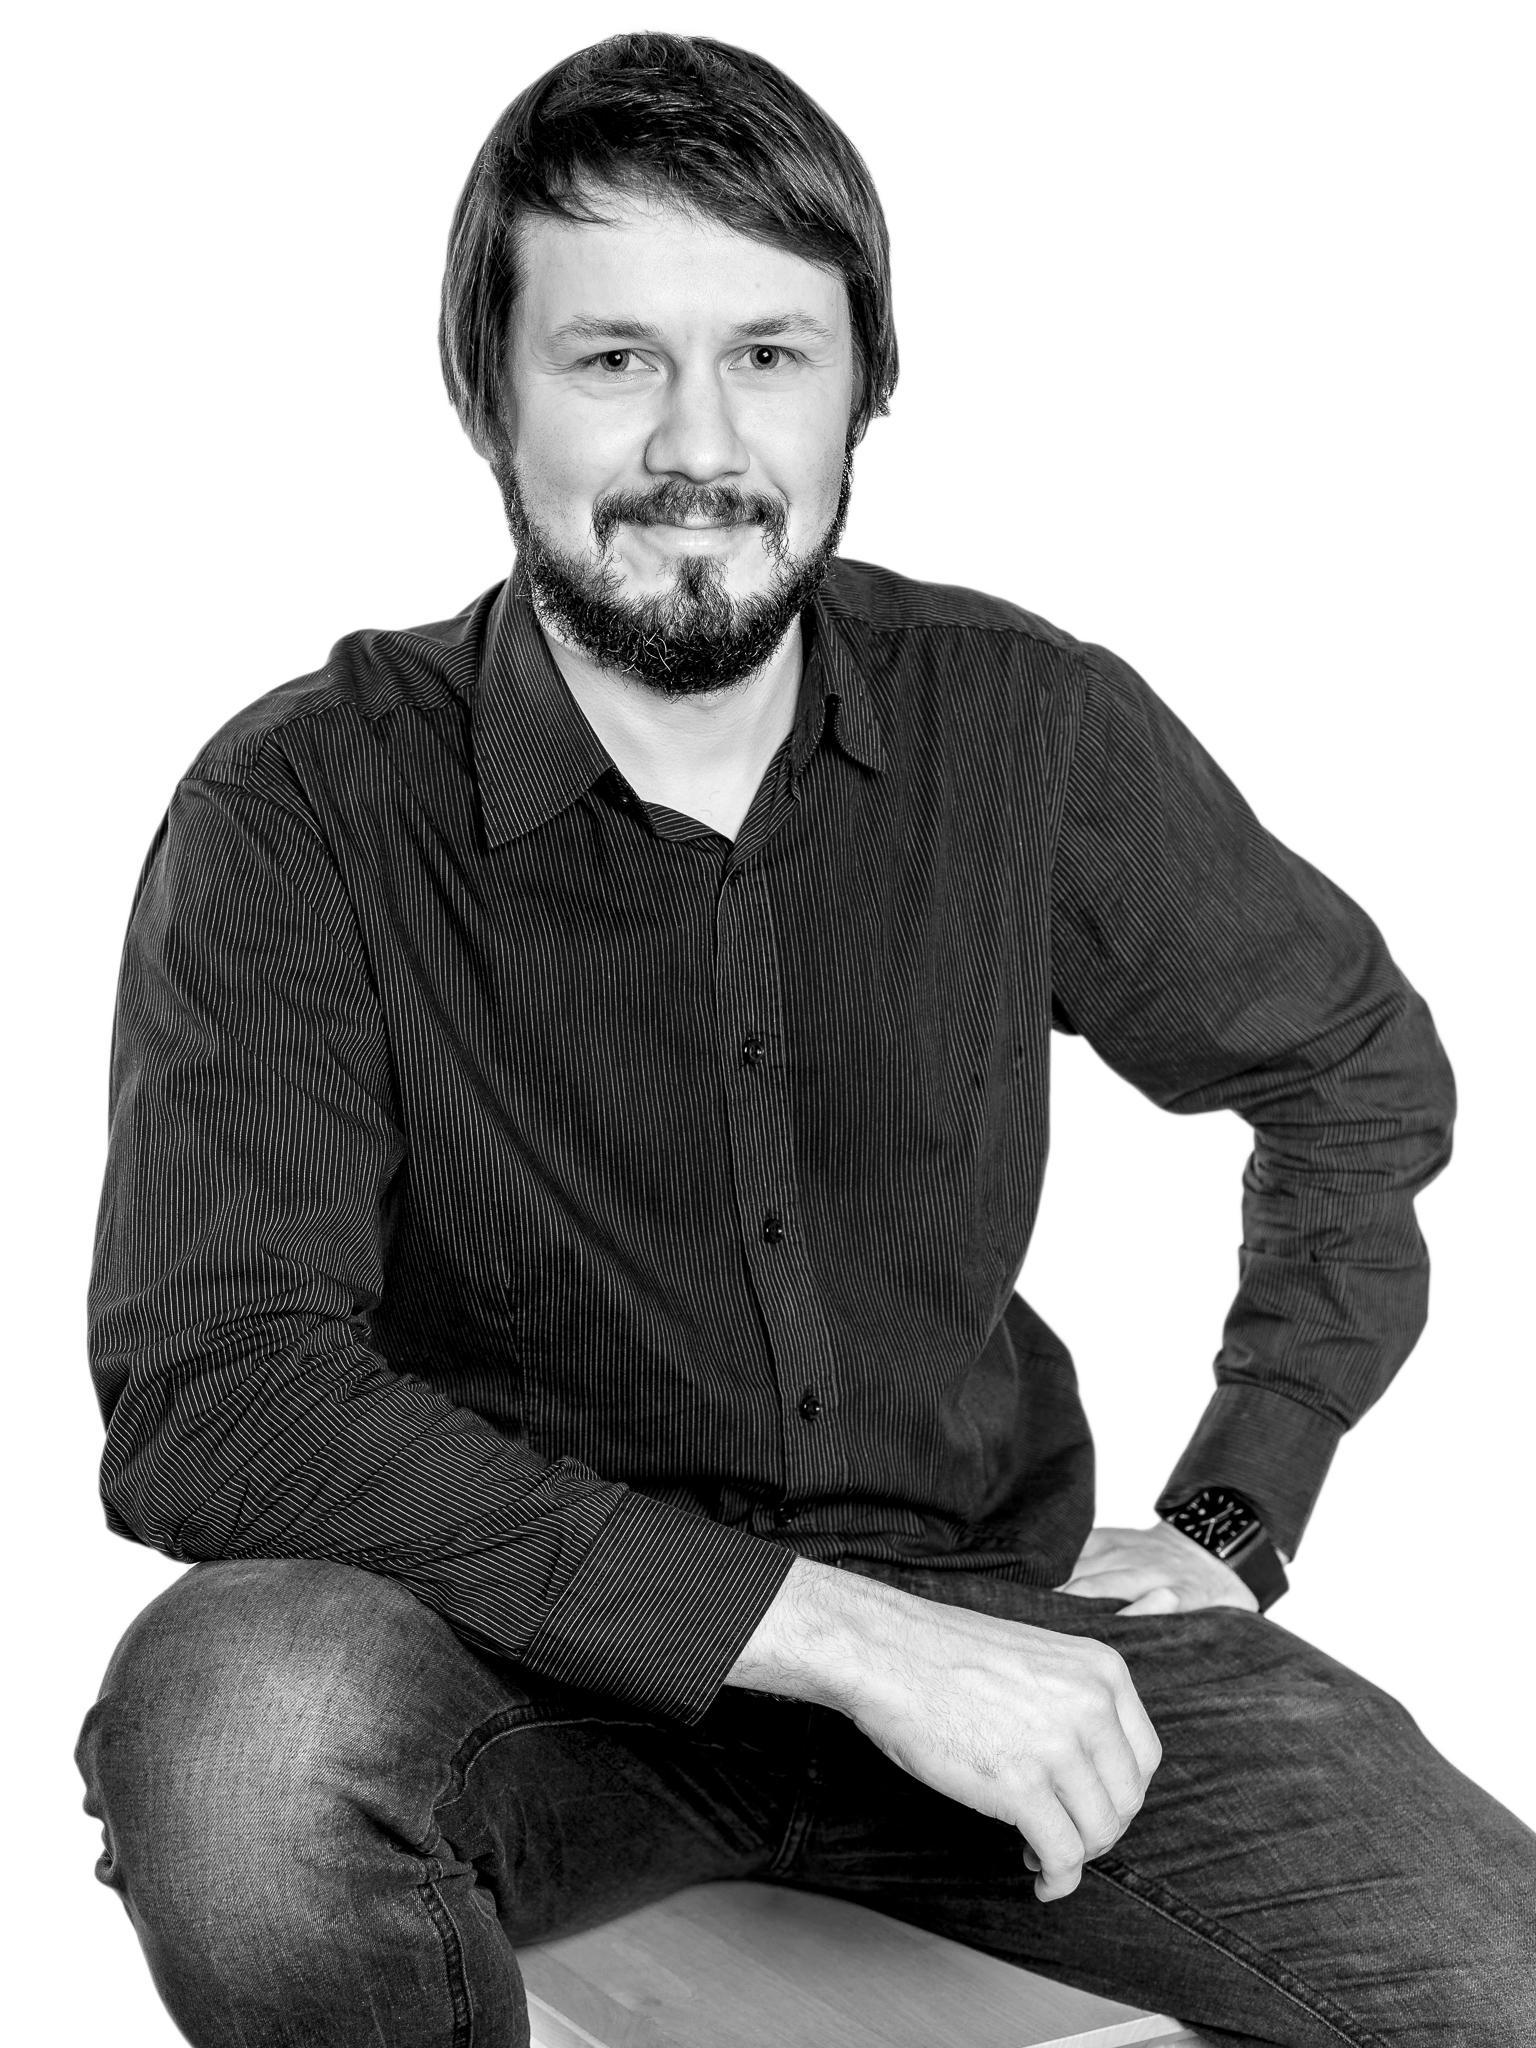 Kristjan Männigo - Architectkristjan@ars.ee